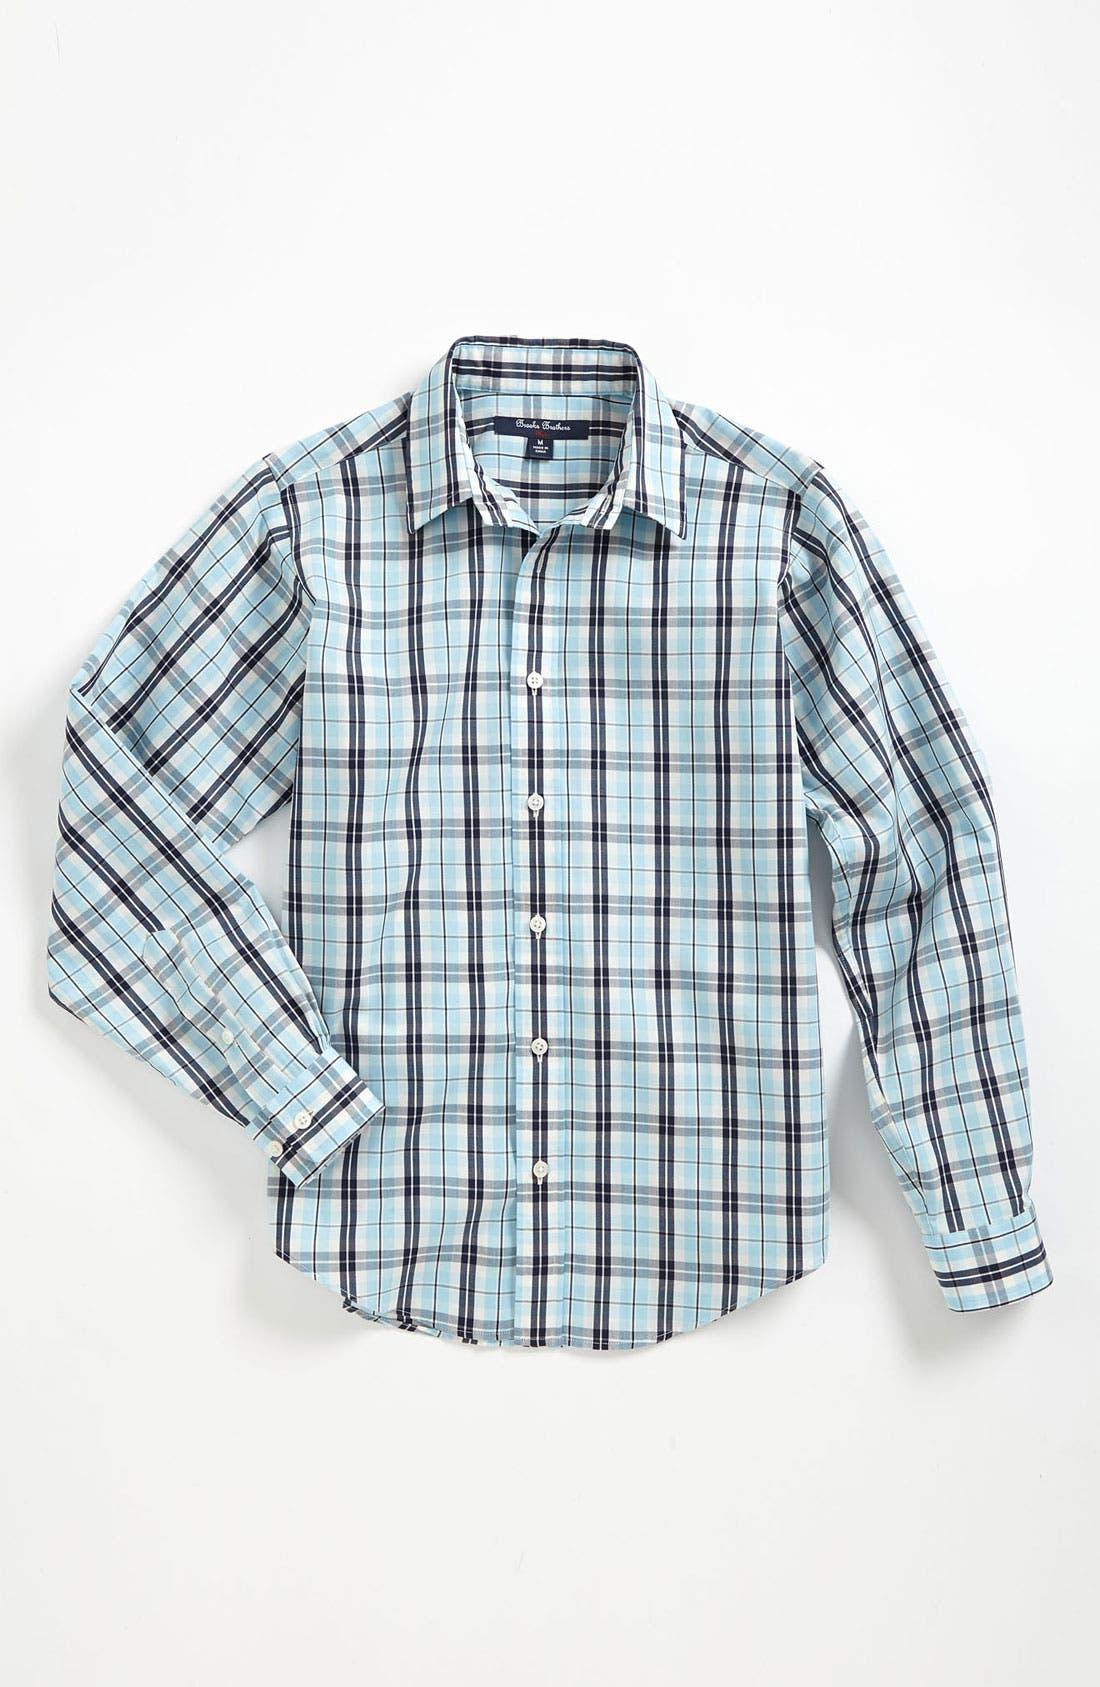 Alternate Image 1 Selected - Brooks Brothers Check Sport Shirt (Big Boys)